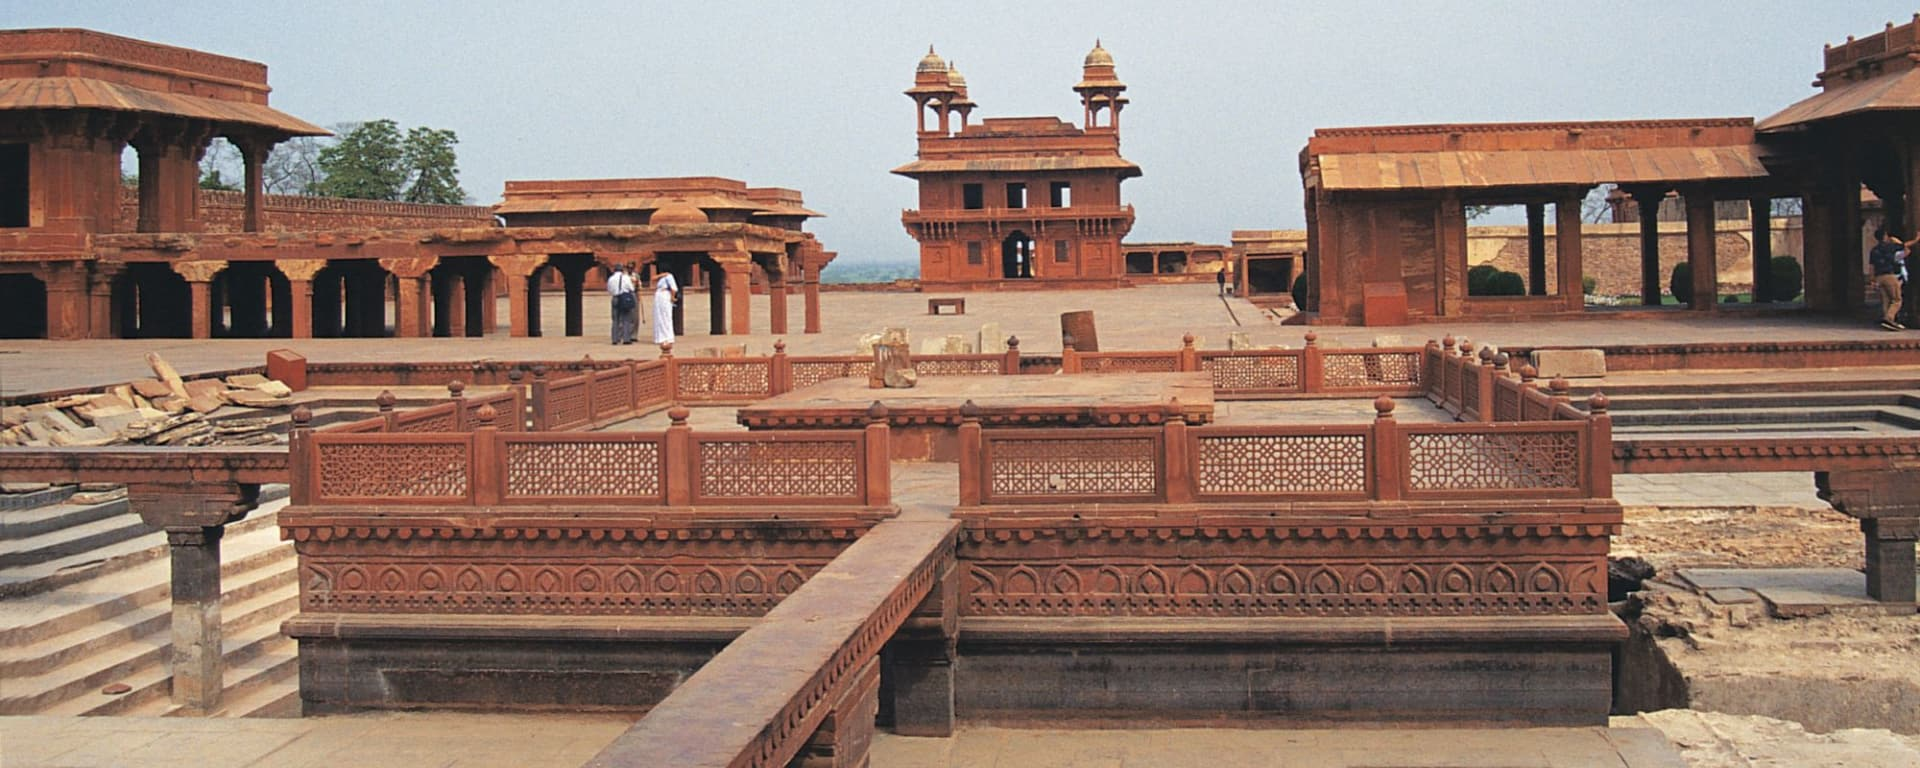 Höhepunkte Rajasthans ab Delhi: Fatehpur Sikri: Kings Palace